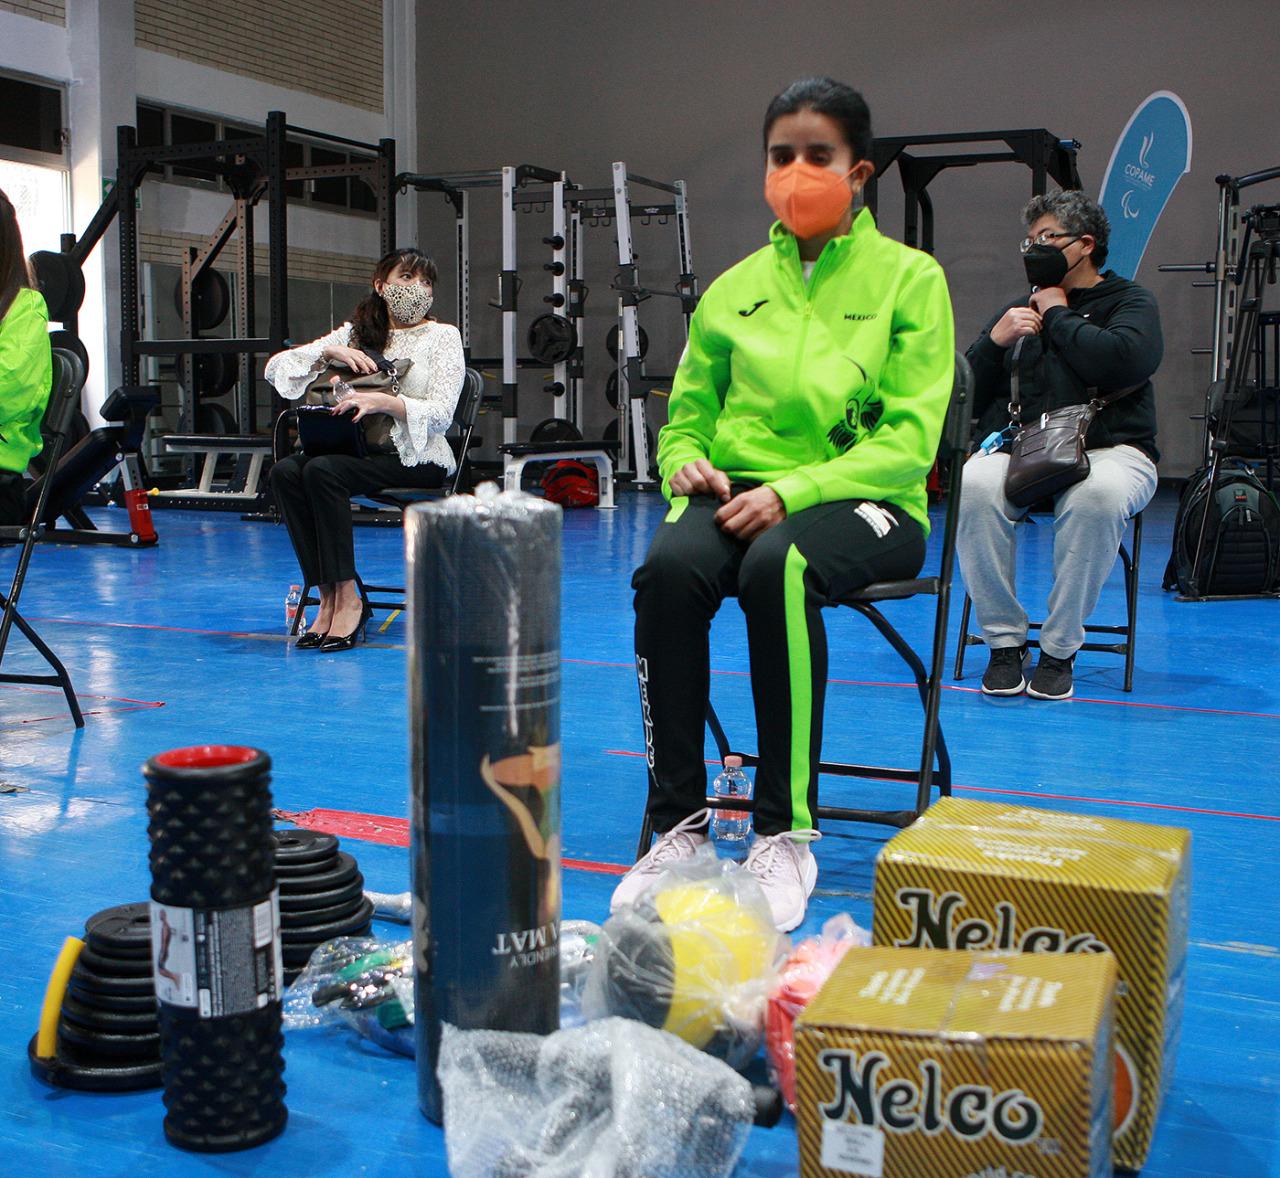 /cms/uploads/image/file/640028/Entrega_CONADE_material_deportivo_a_atletas_rumbo_a_Juegos_Paral_mpicos_2.jpeg